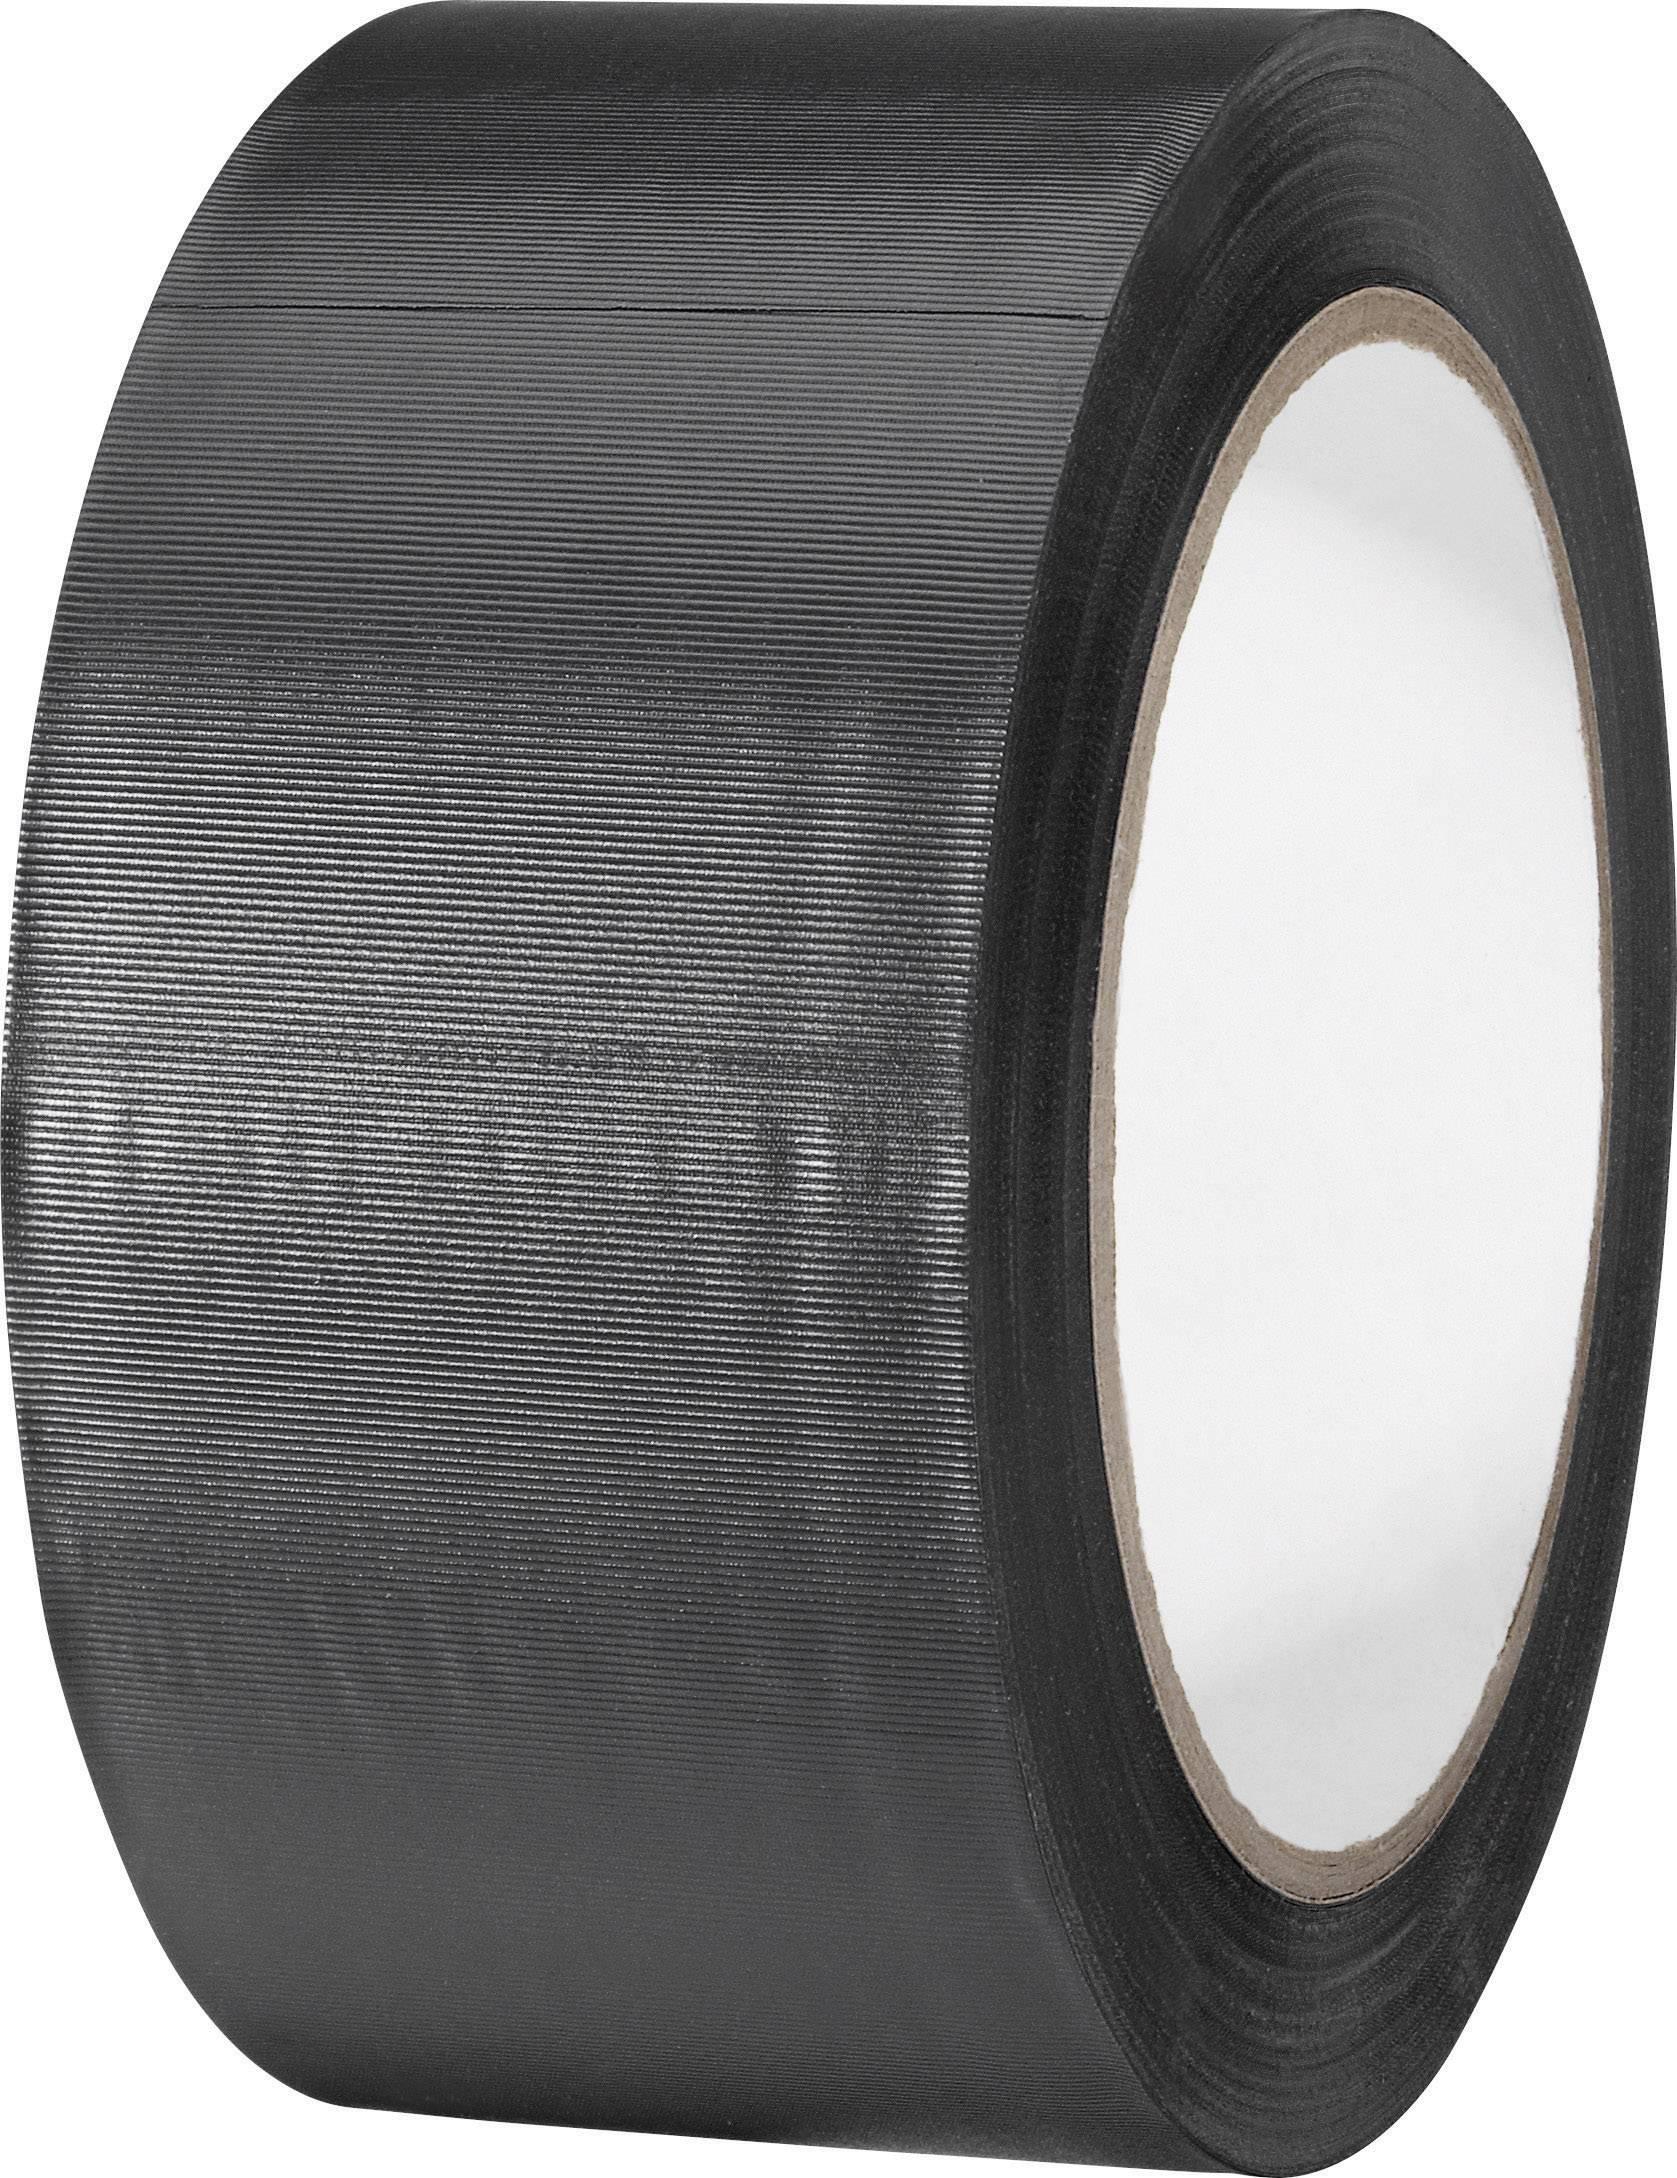 PVC tape TOOLCRAFT 832450S-C 832450S-C, (d x š) 33 m x 50 mm, čierna, 1 roliek